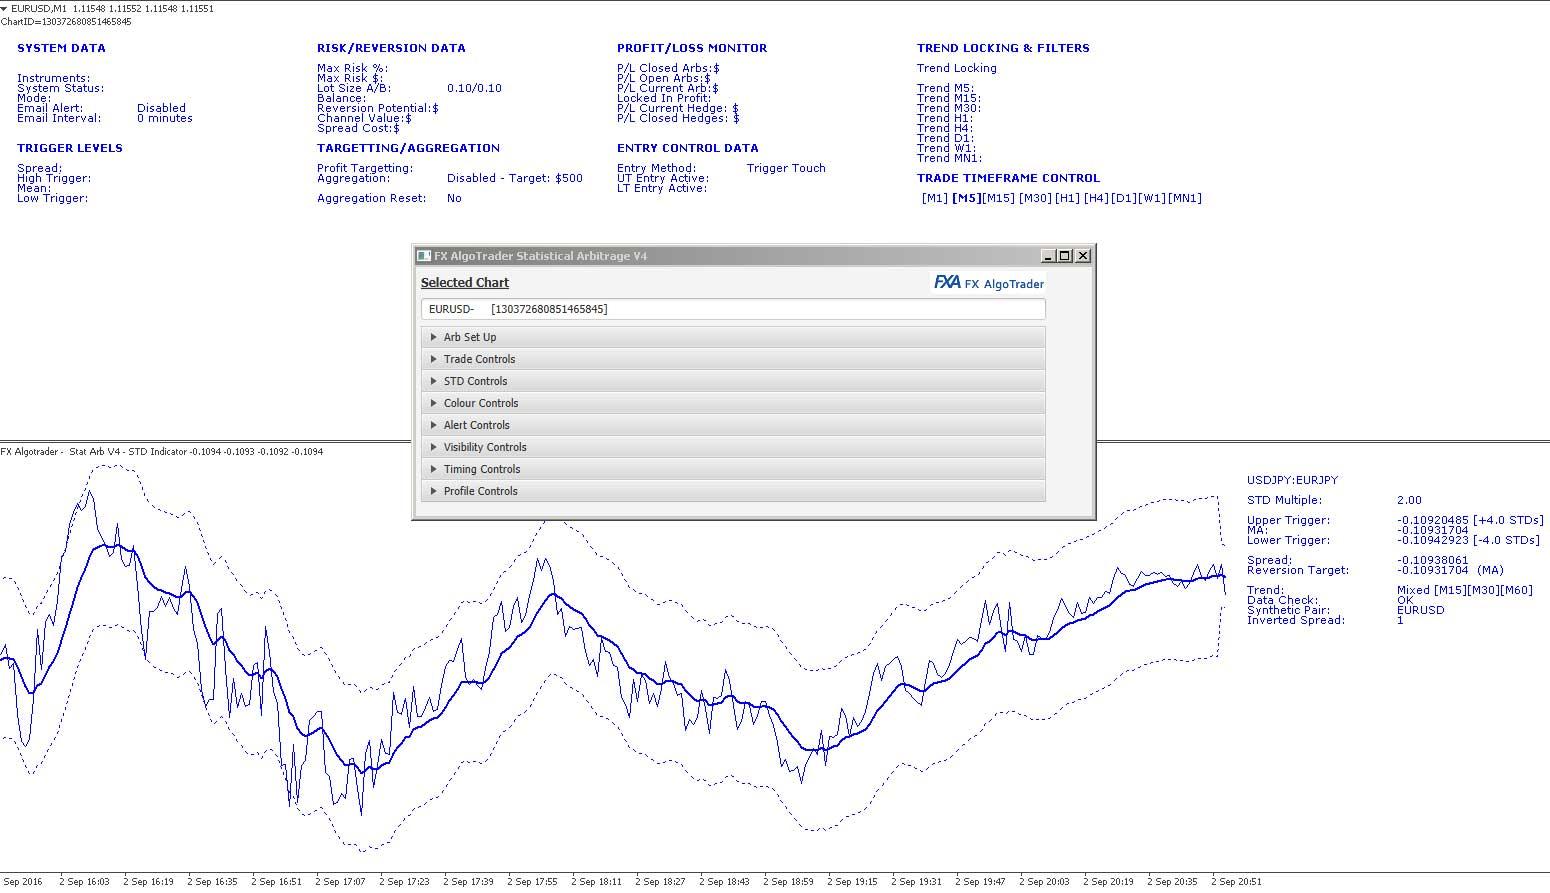 Forex statistical arbitrage correlation